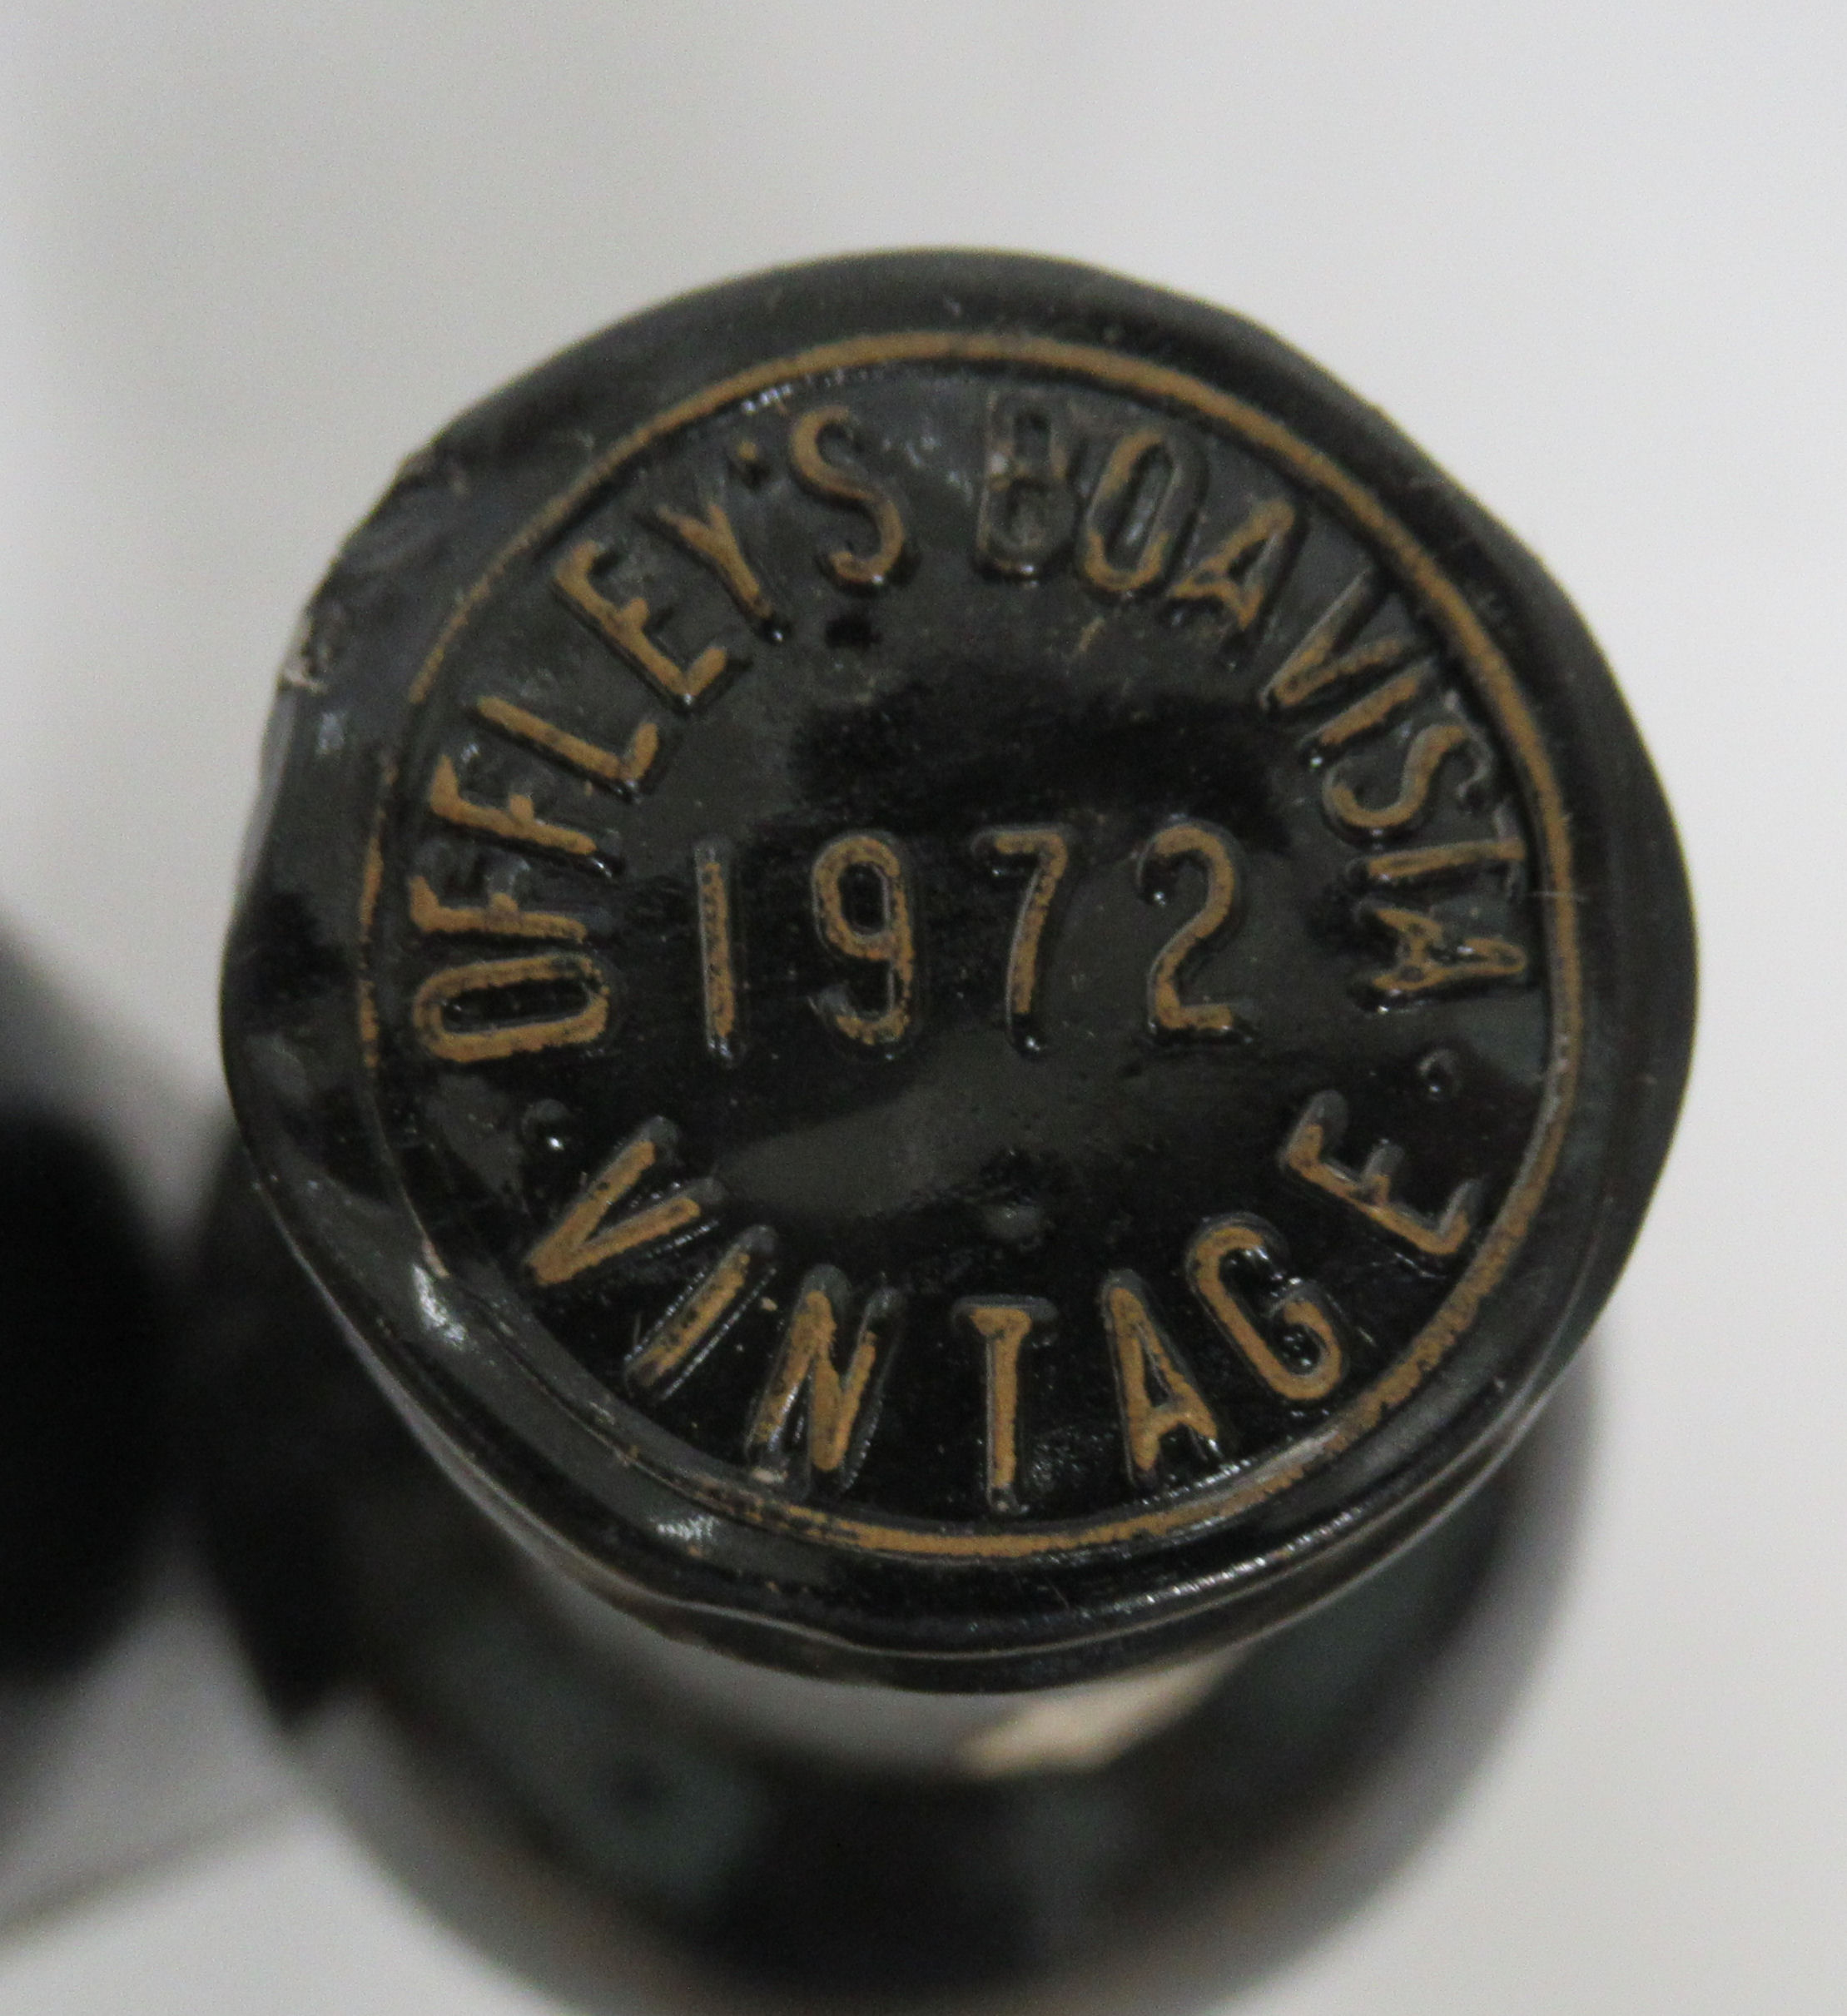 Wine, three bottles of Offley Vintage Port 1970, 1972 & 1977 - Image 4 of 4